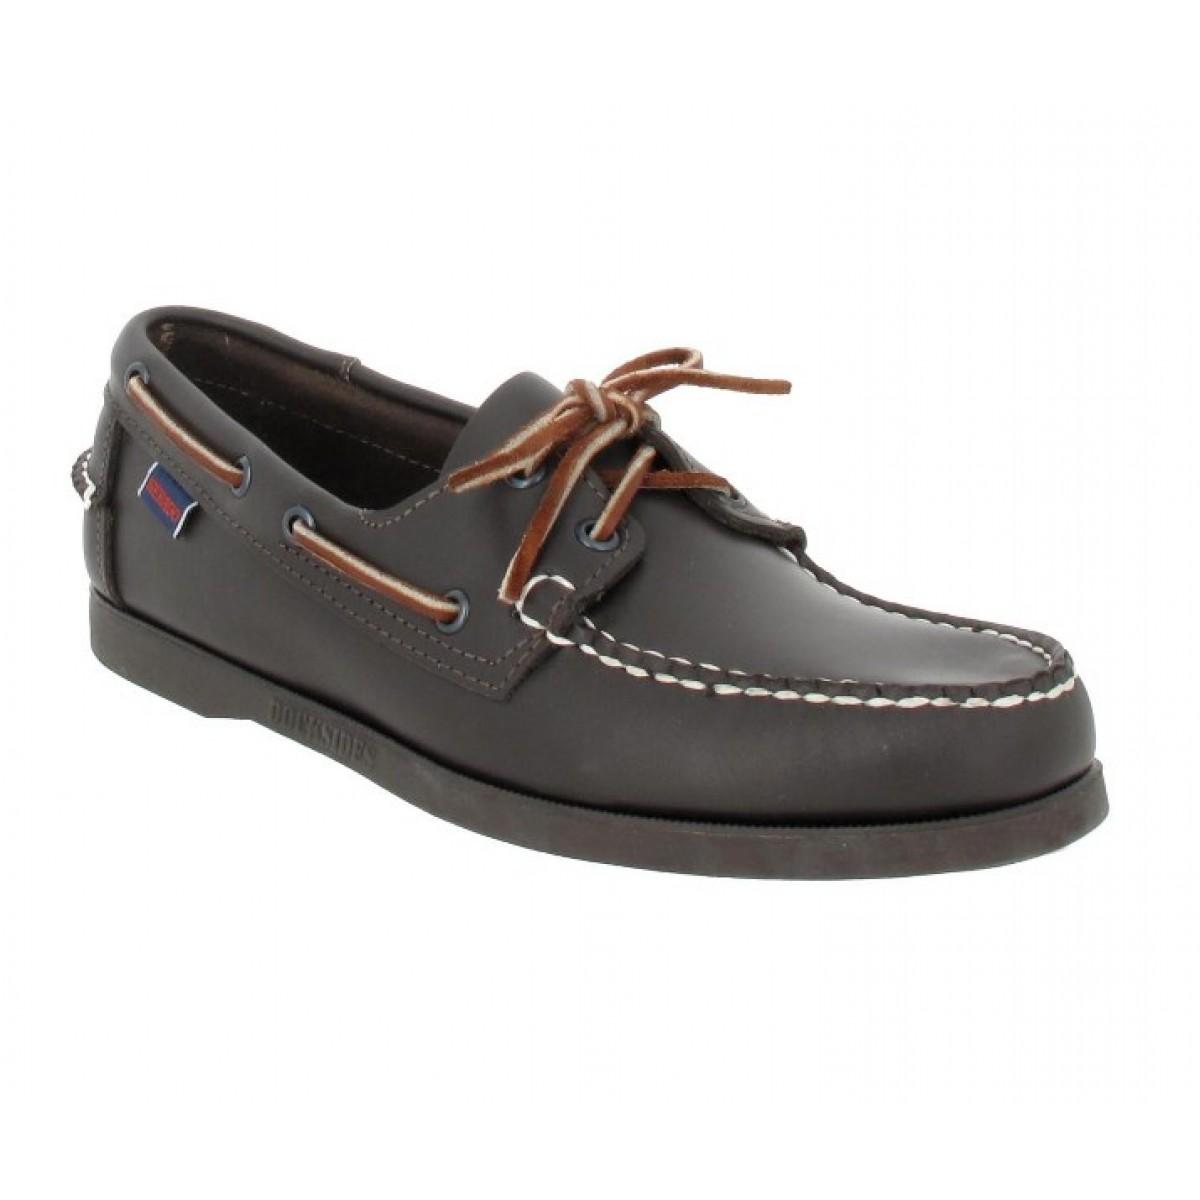 Chaussures bateaux SEBAGO Docksides cuir Homme Brown